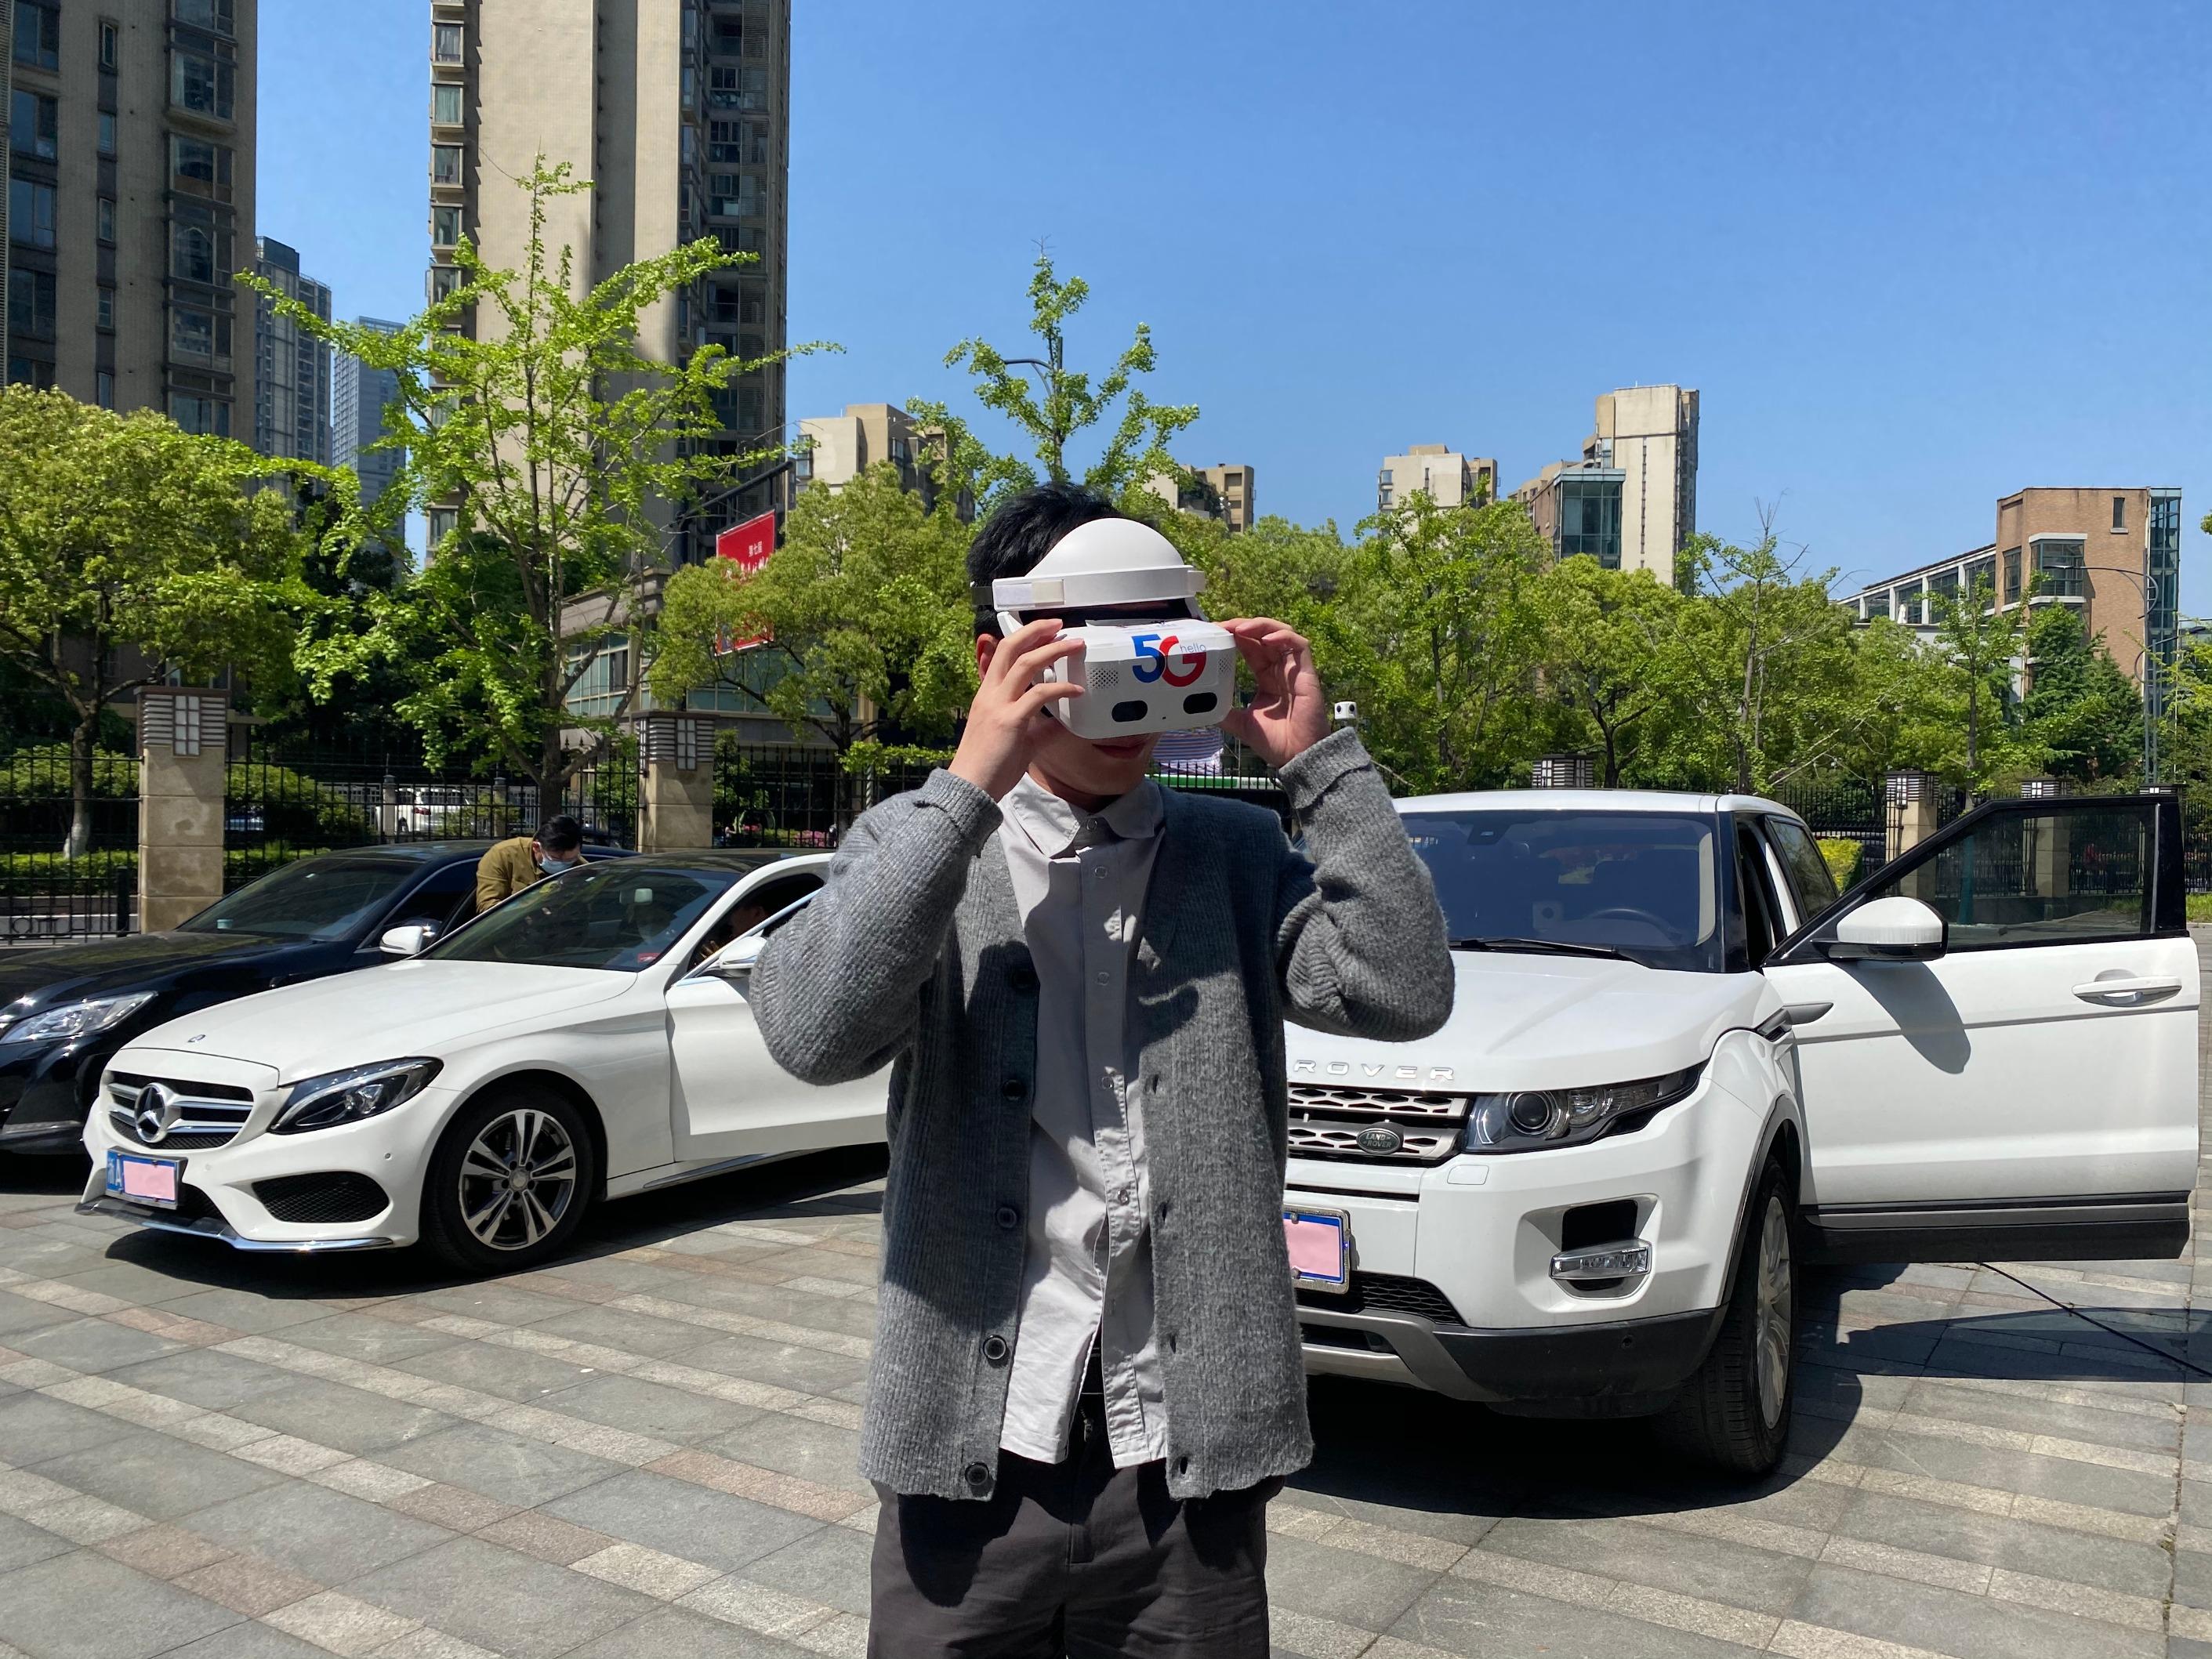 「5G+VR」のオンライン競売、杭州インターネット裁判所が初の試み